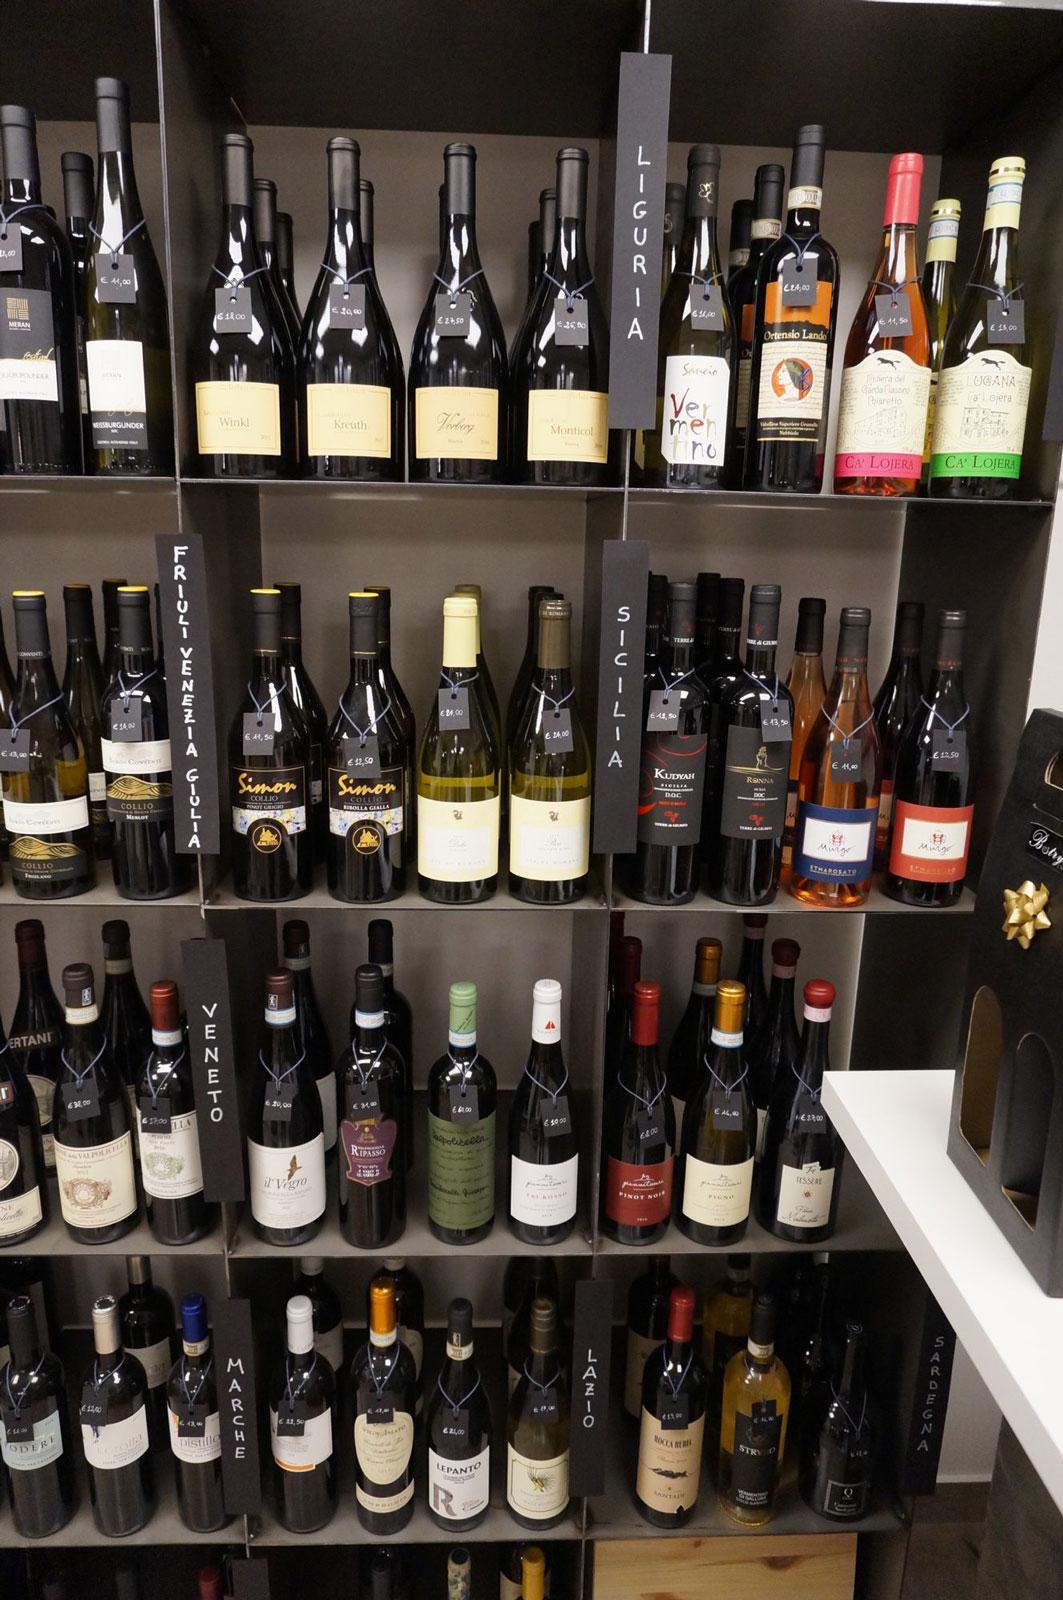 Enoteca di vini Botrytis dal Friuli Venezia Giulia e Veneto